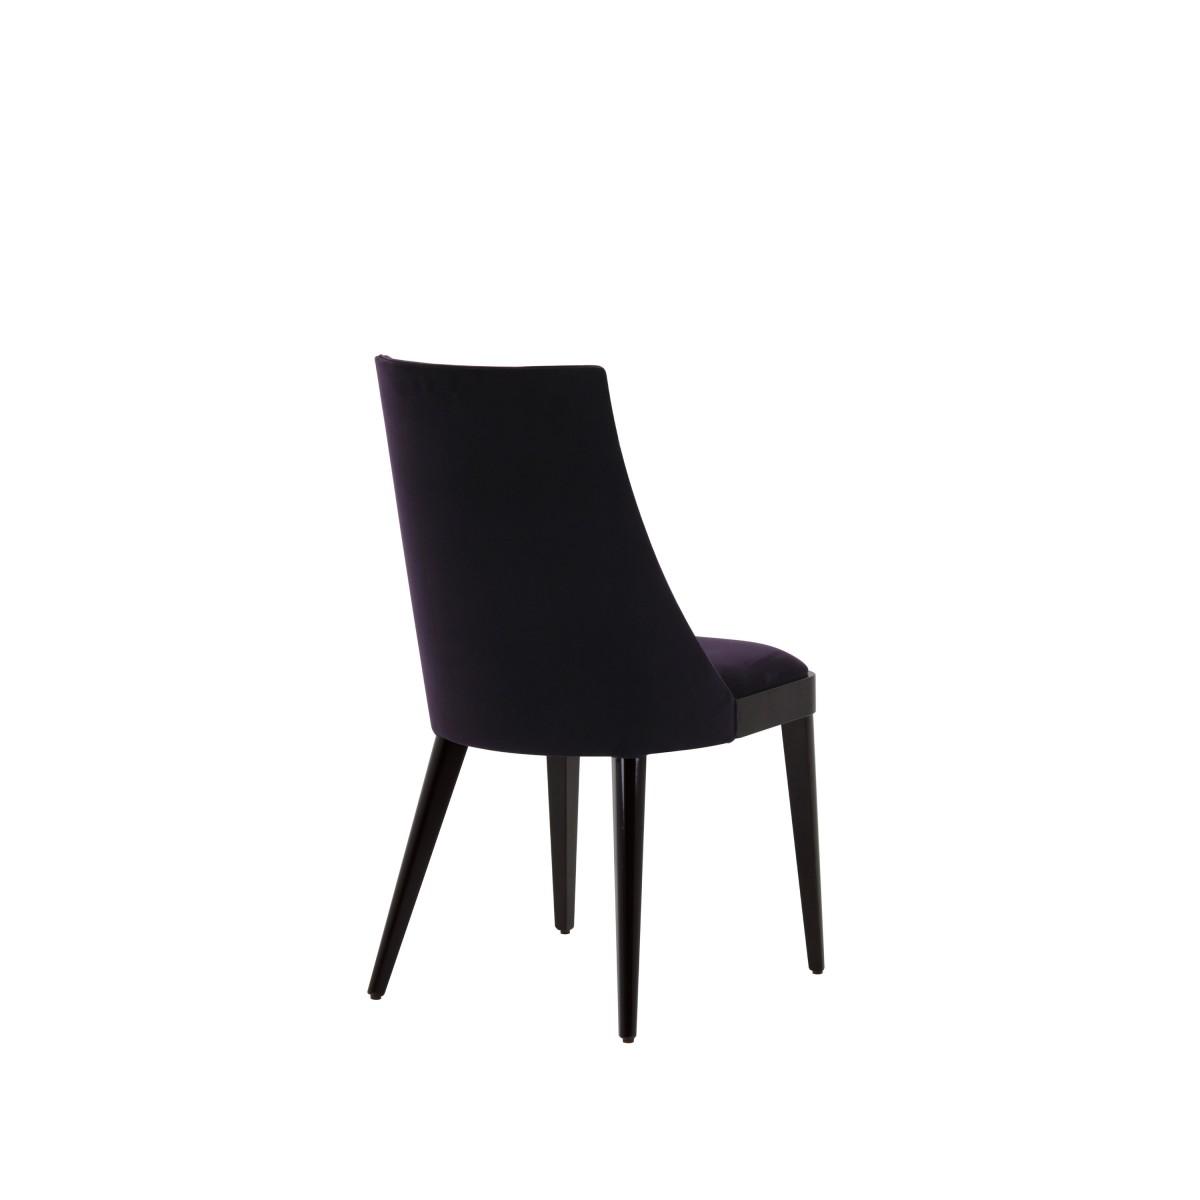 3252 modern style wood chair norvegia5